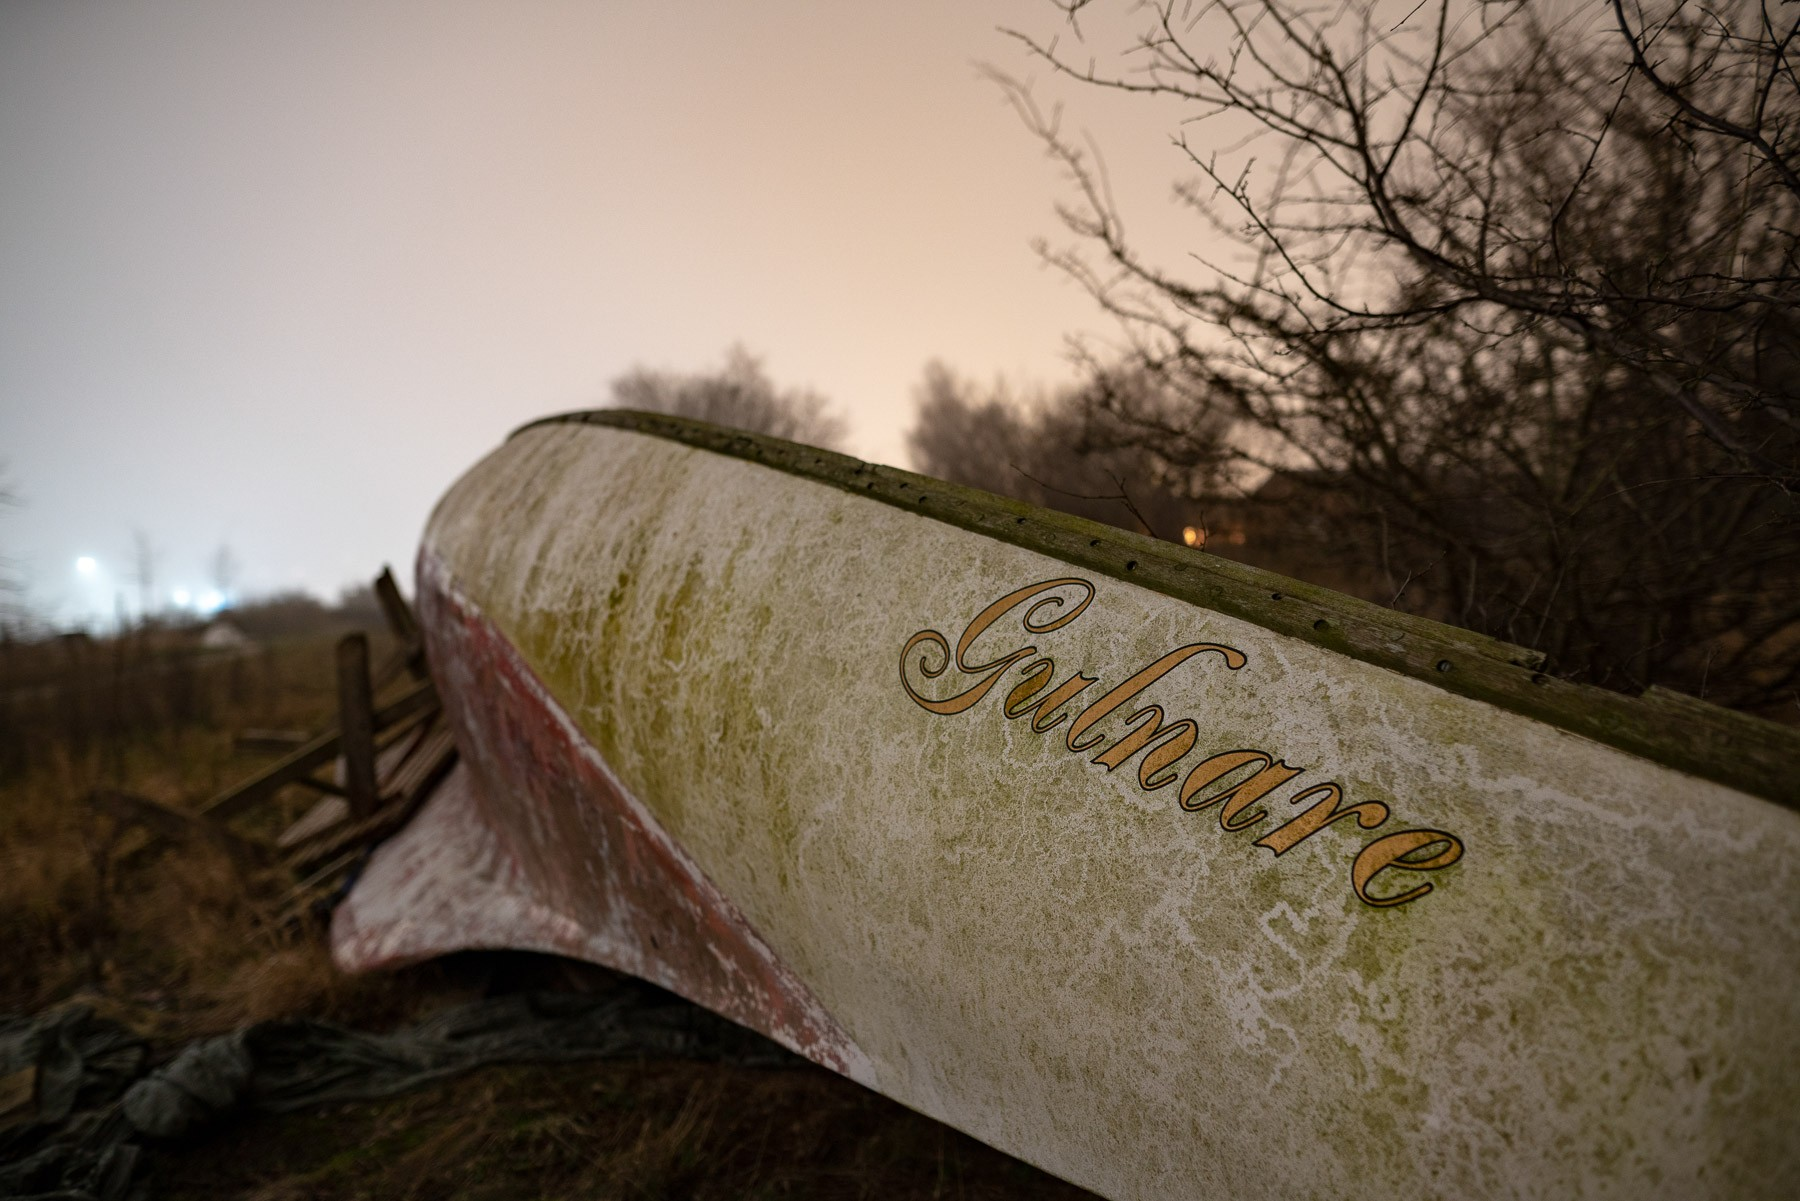 Båden Gulnare ligger og flyder i Haveforeningen Nokken